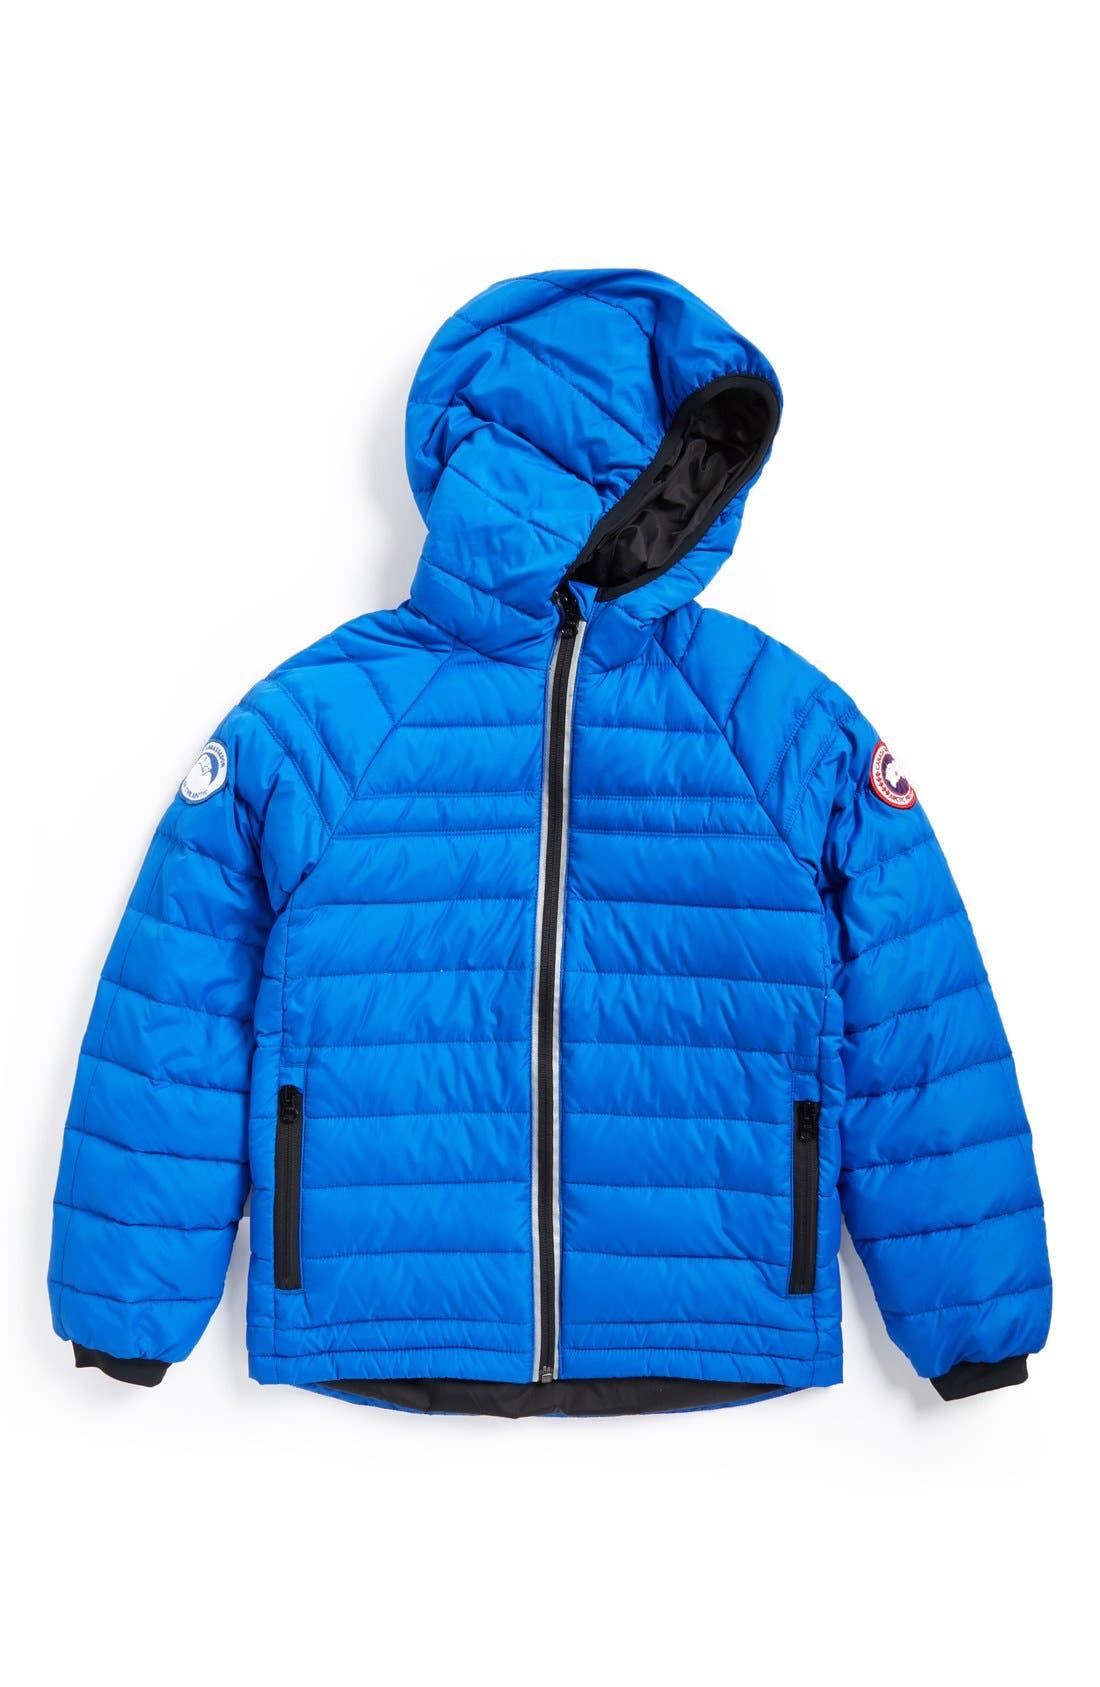 Sherwood Hooded Packable Jacket,                         Main,                         color, Royal Blue